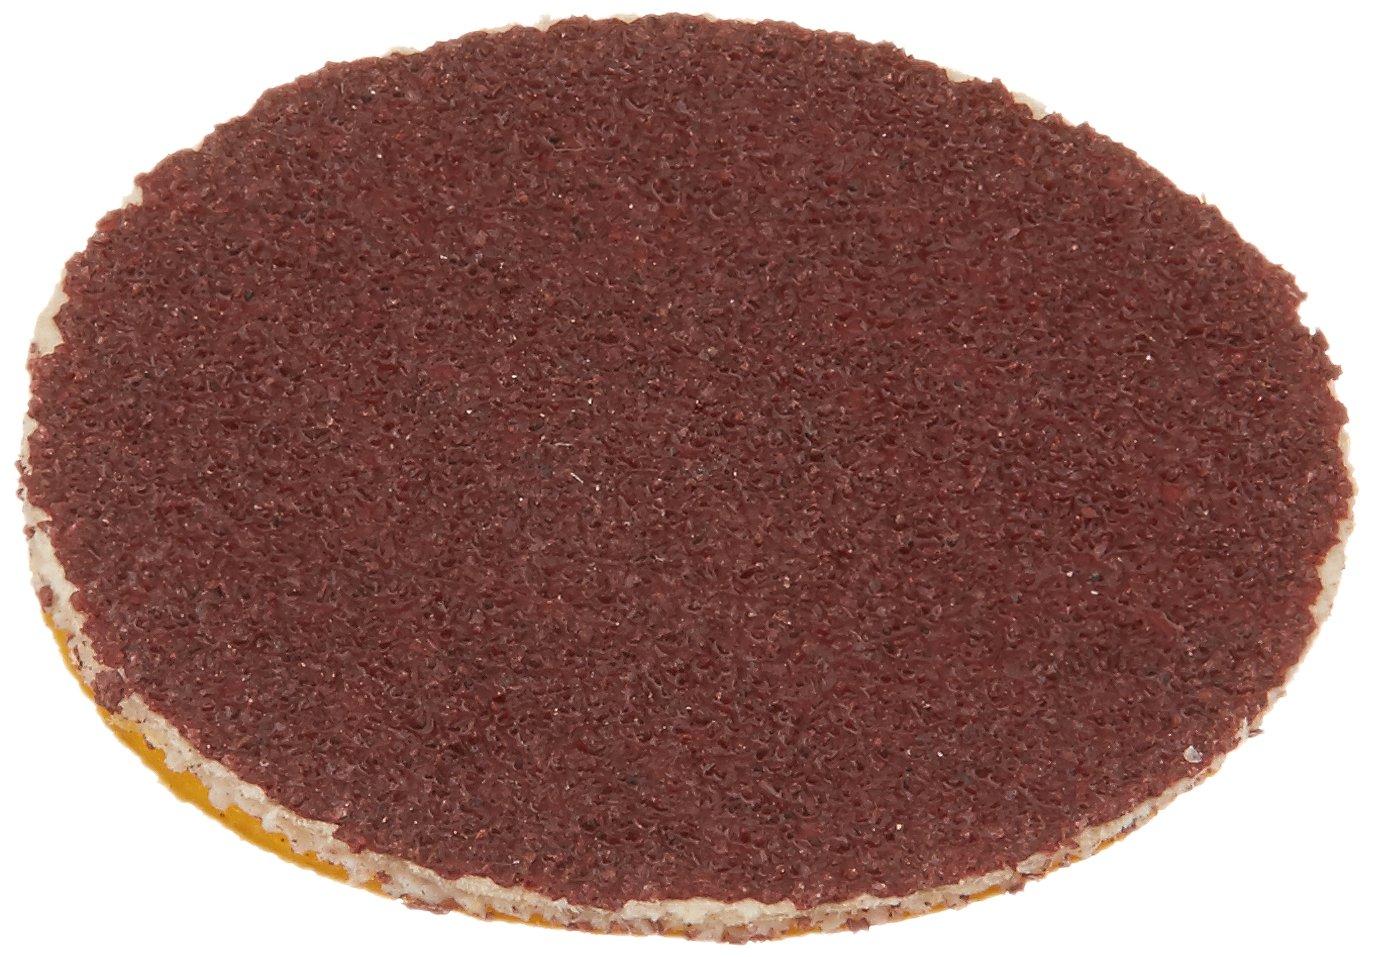 Proxxon Replacement Sanding Discs 18 mm Proxxon Micromot 28983